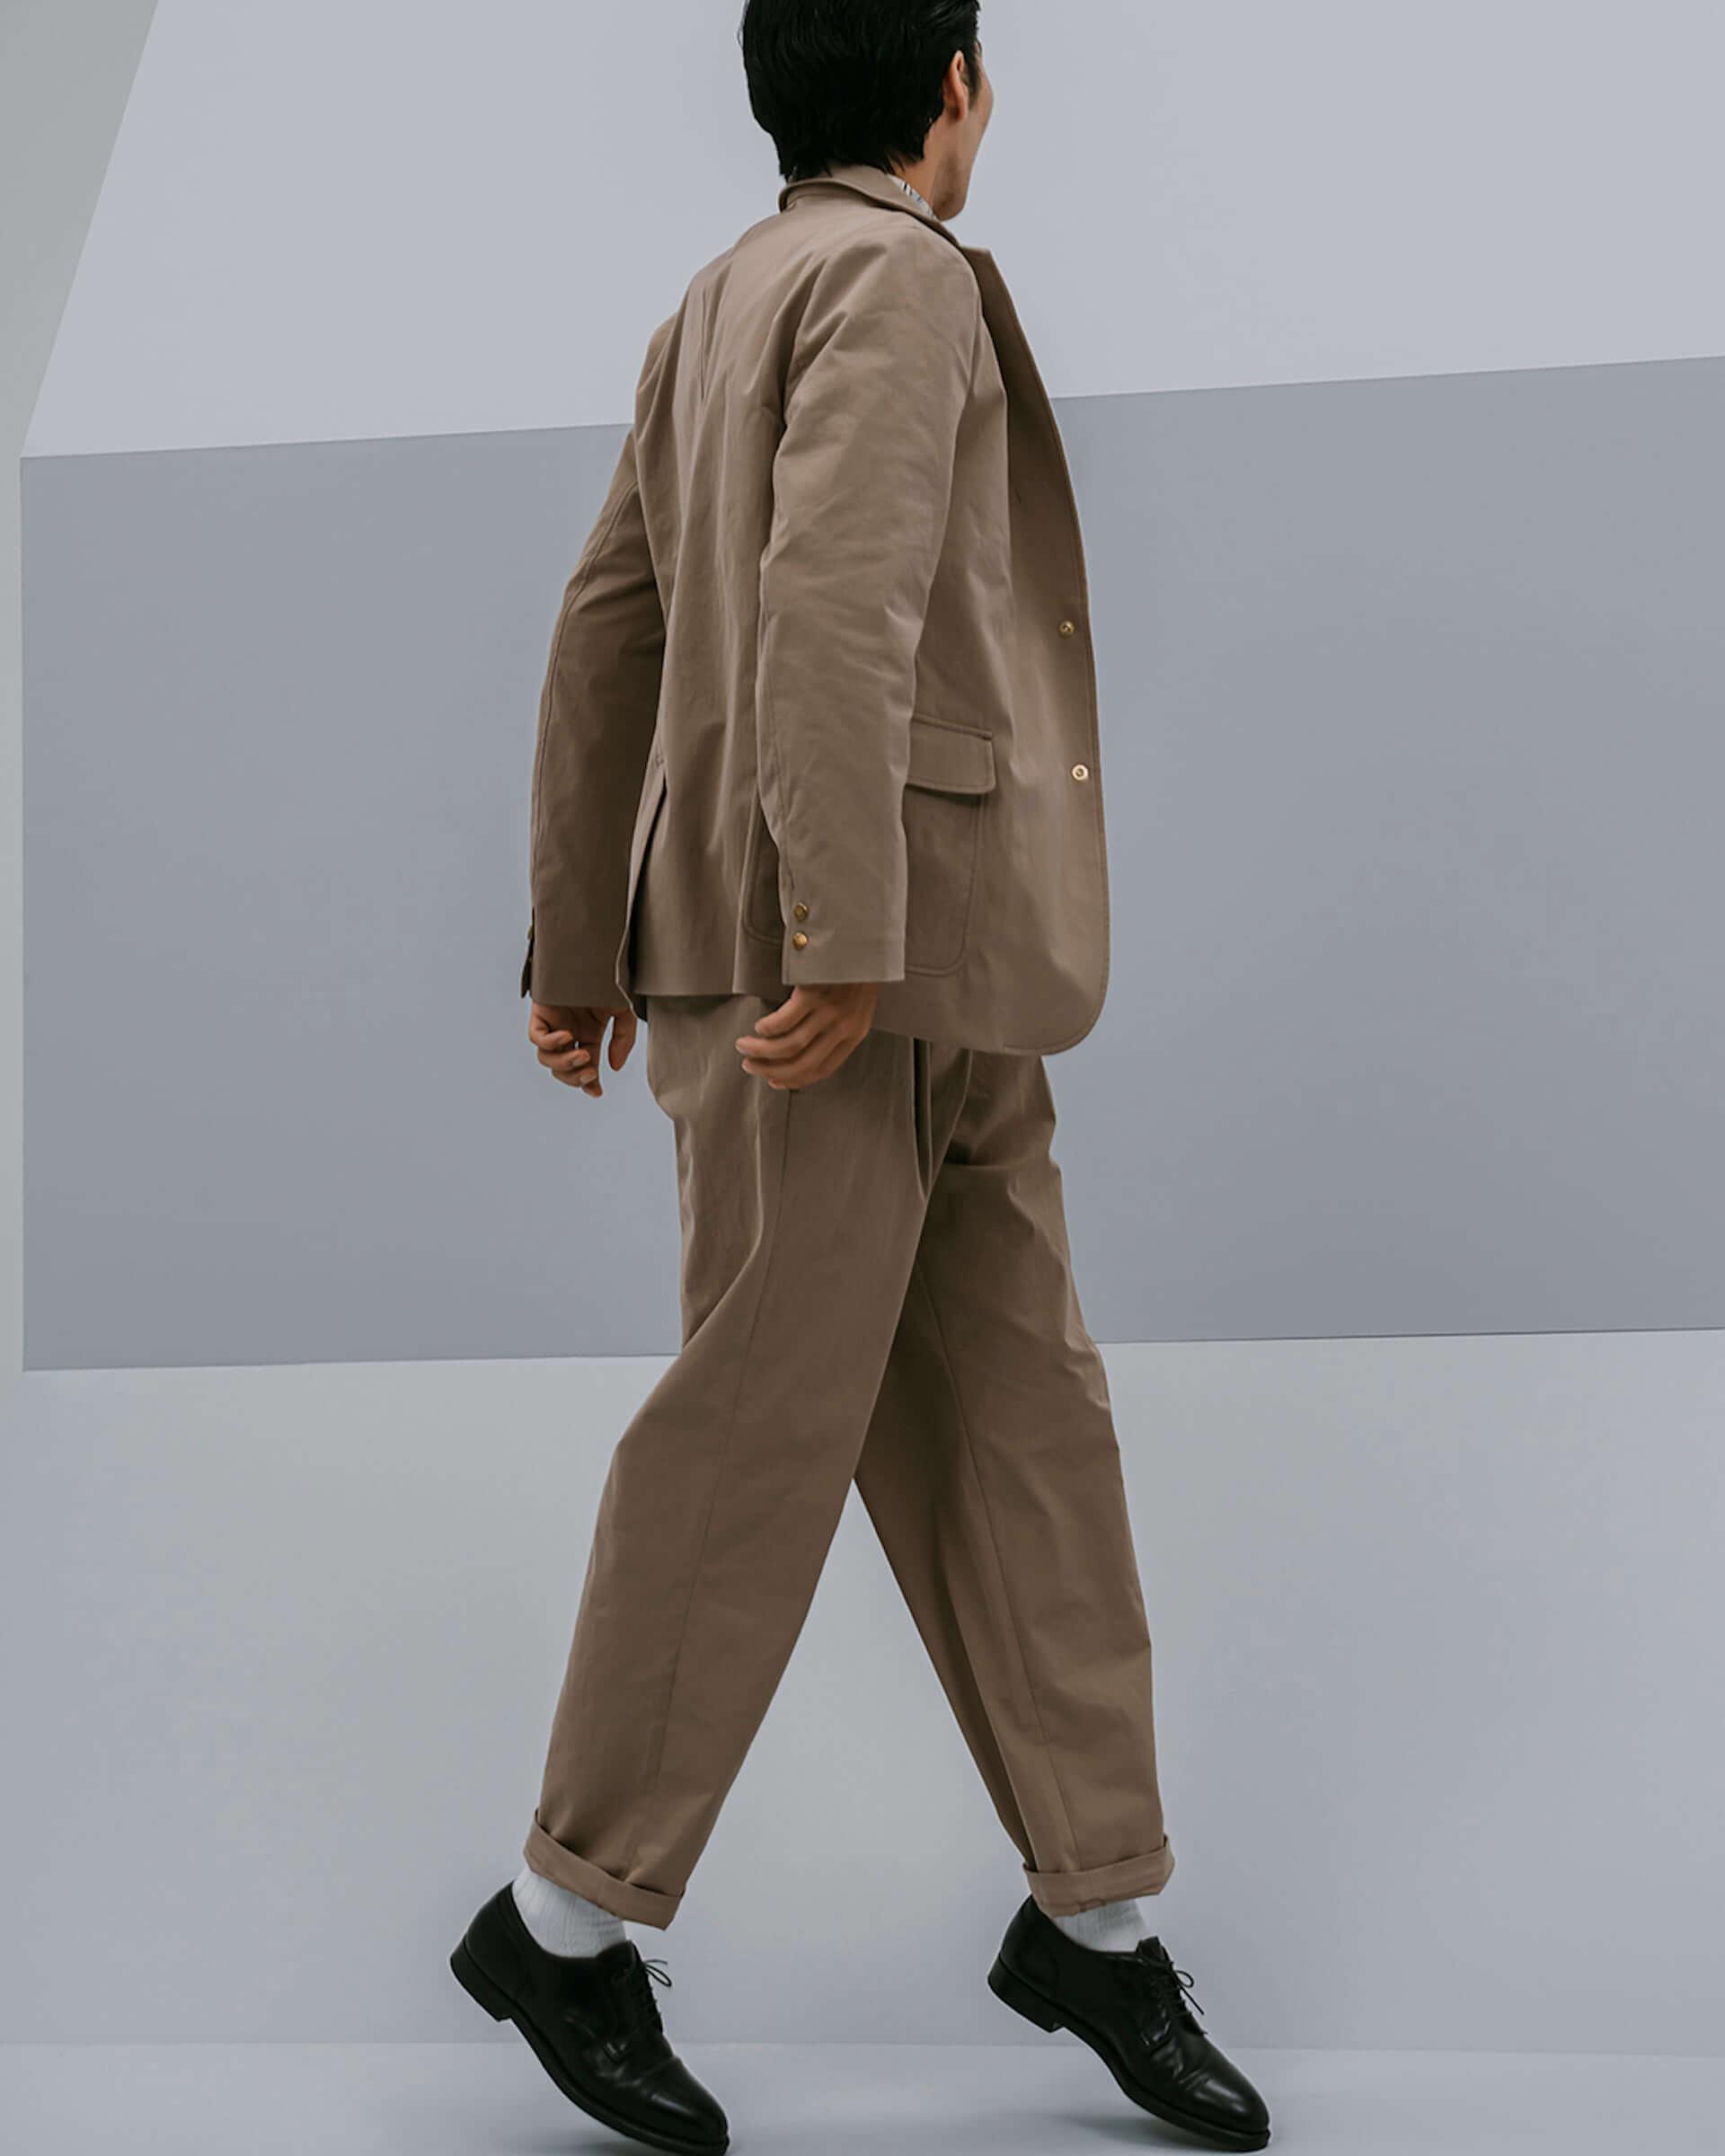 THE NORTH FACE日本橋店の2周年記念に別注コレクション「When the Dawning Brakes」が登場!「GORE-TEX SHAKEDRY」搭載のジャケットも lf201021_tnf-nihonbashi_5-1920x2400